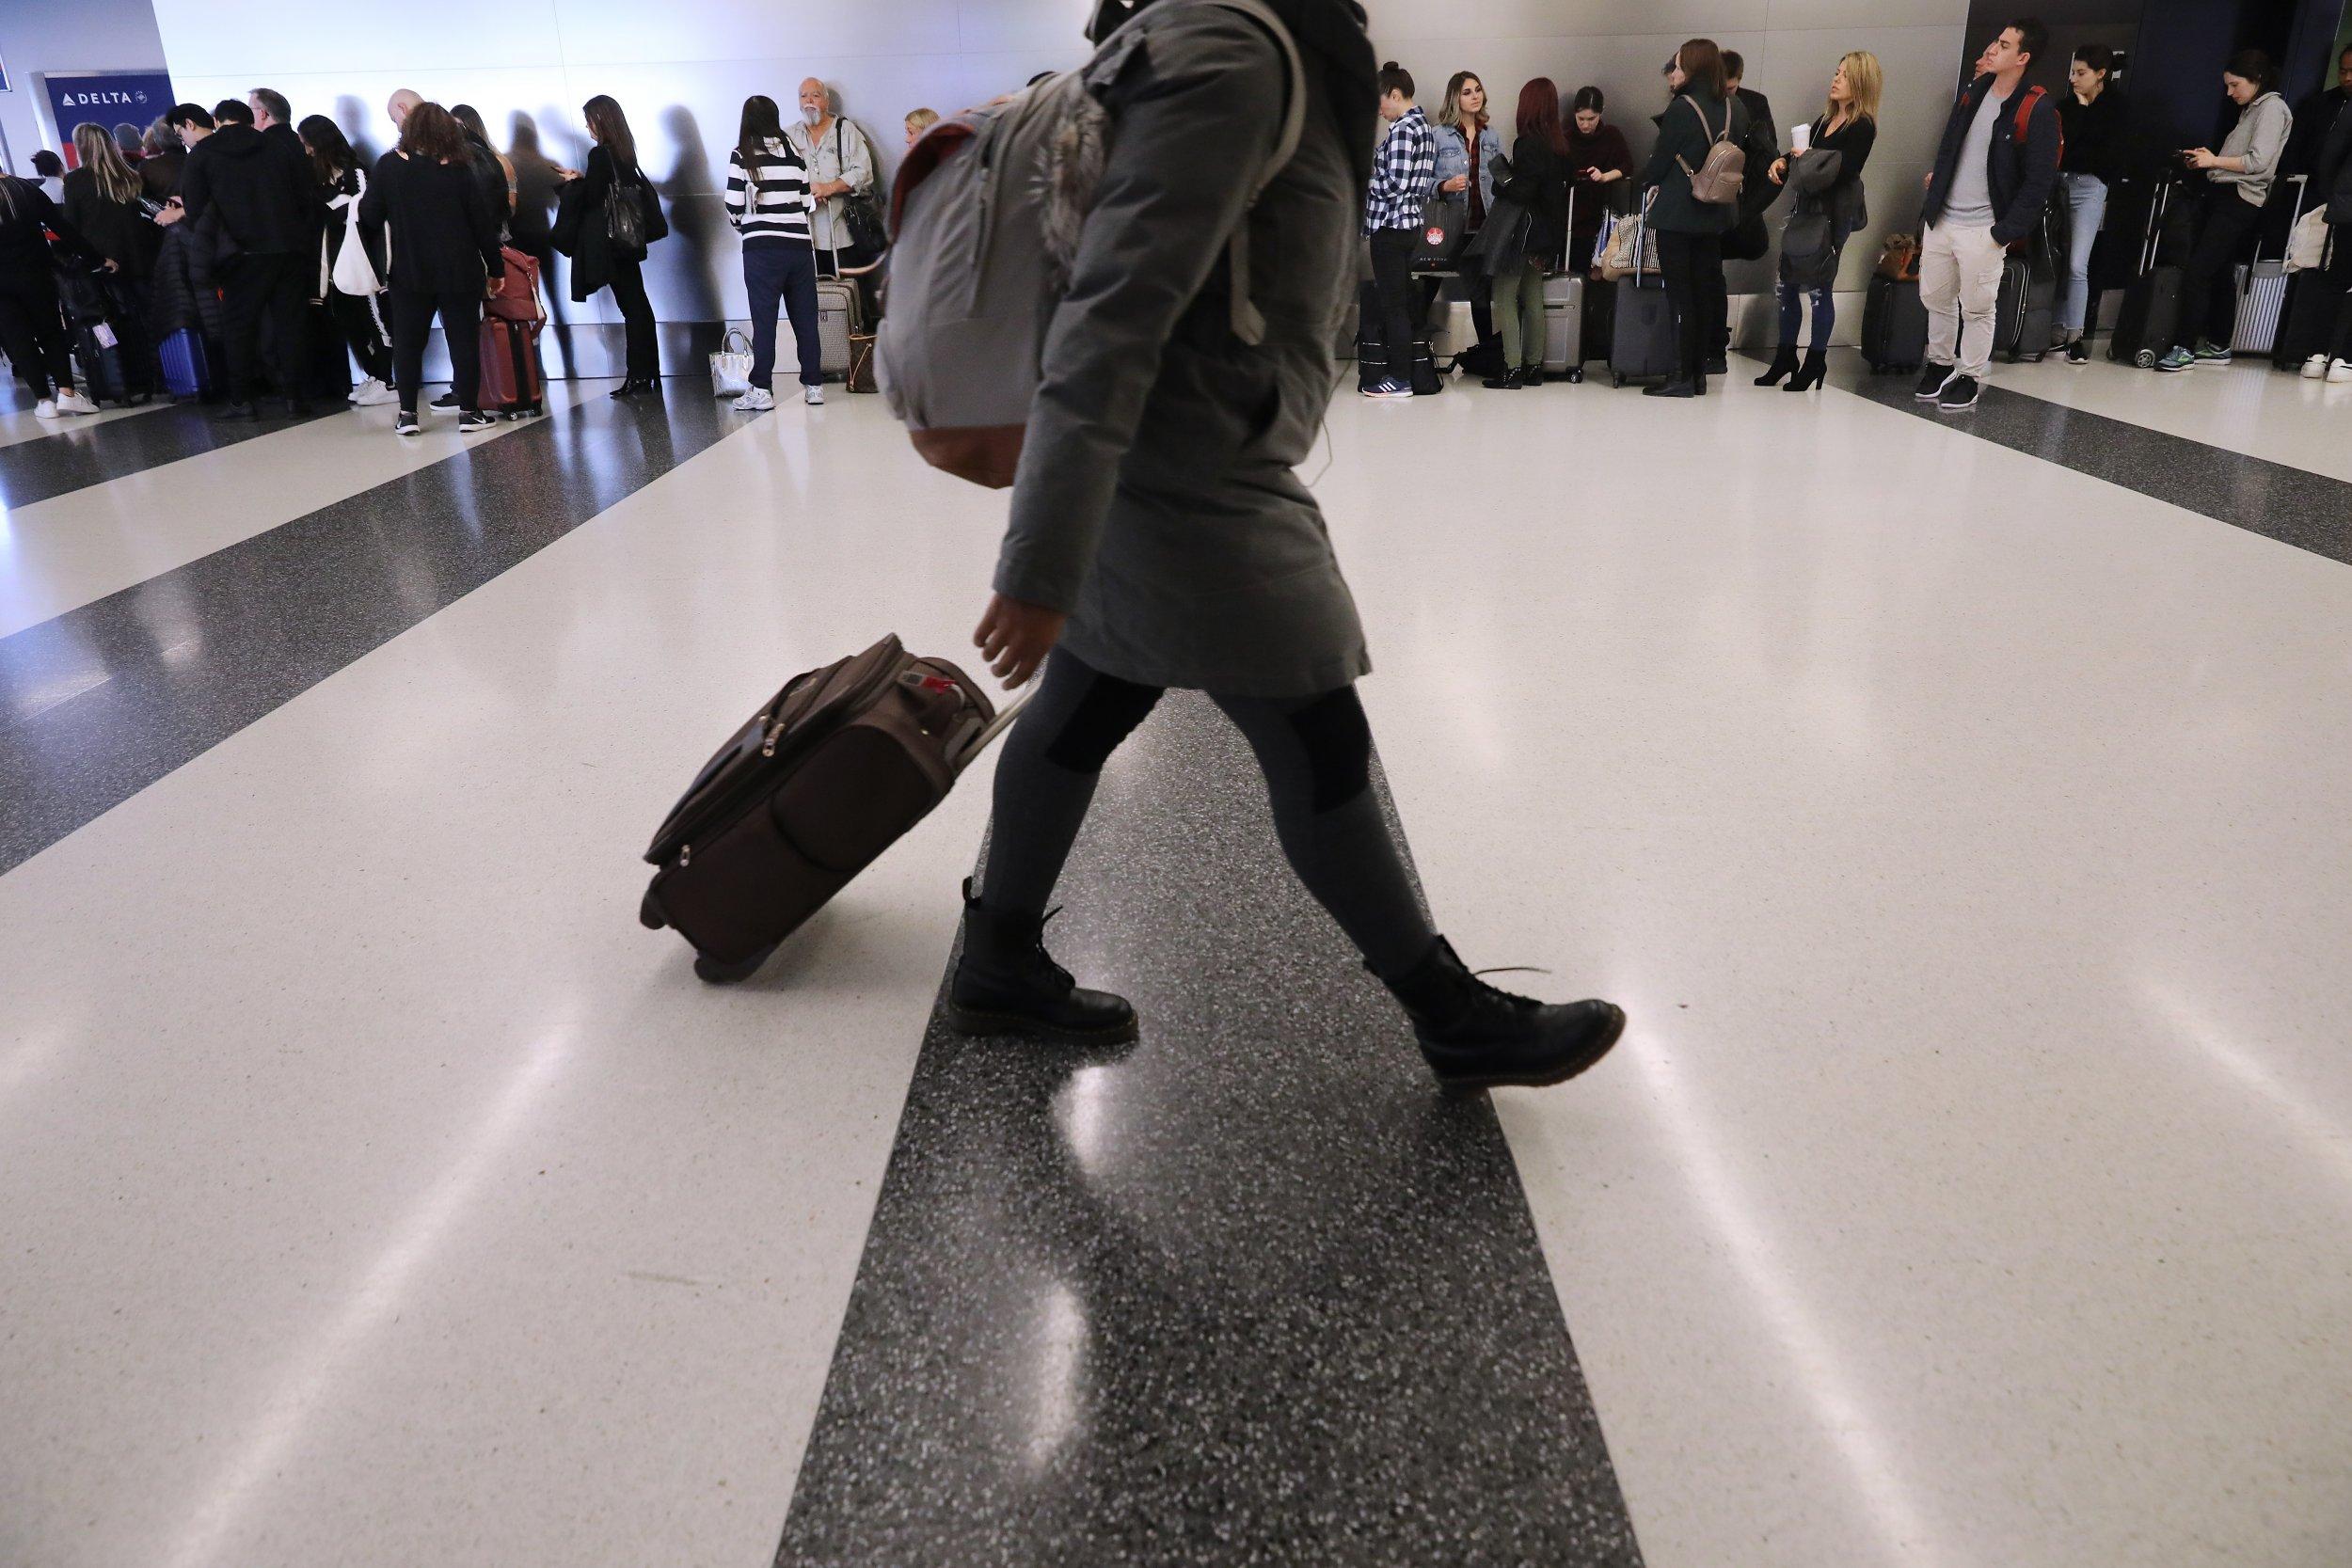 jfk airport waiting